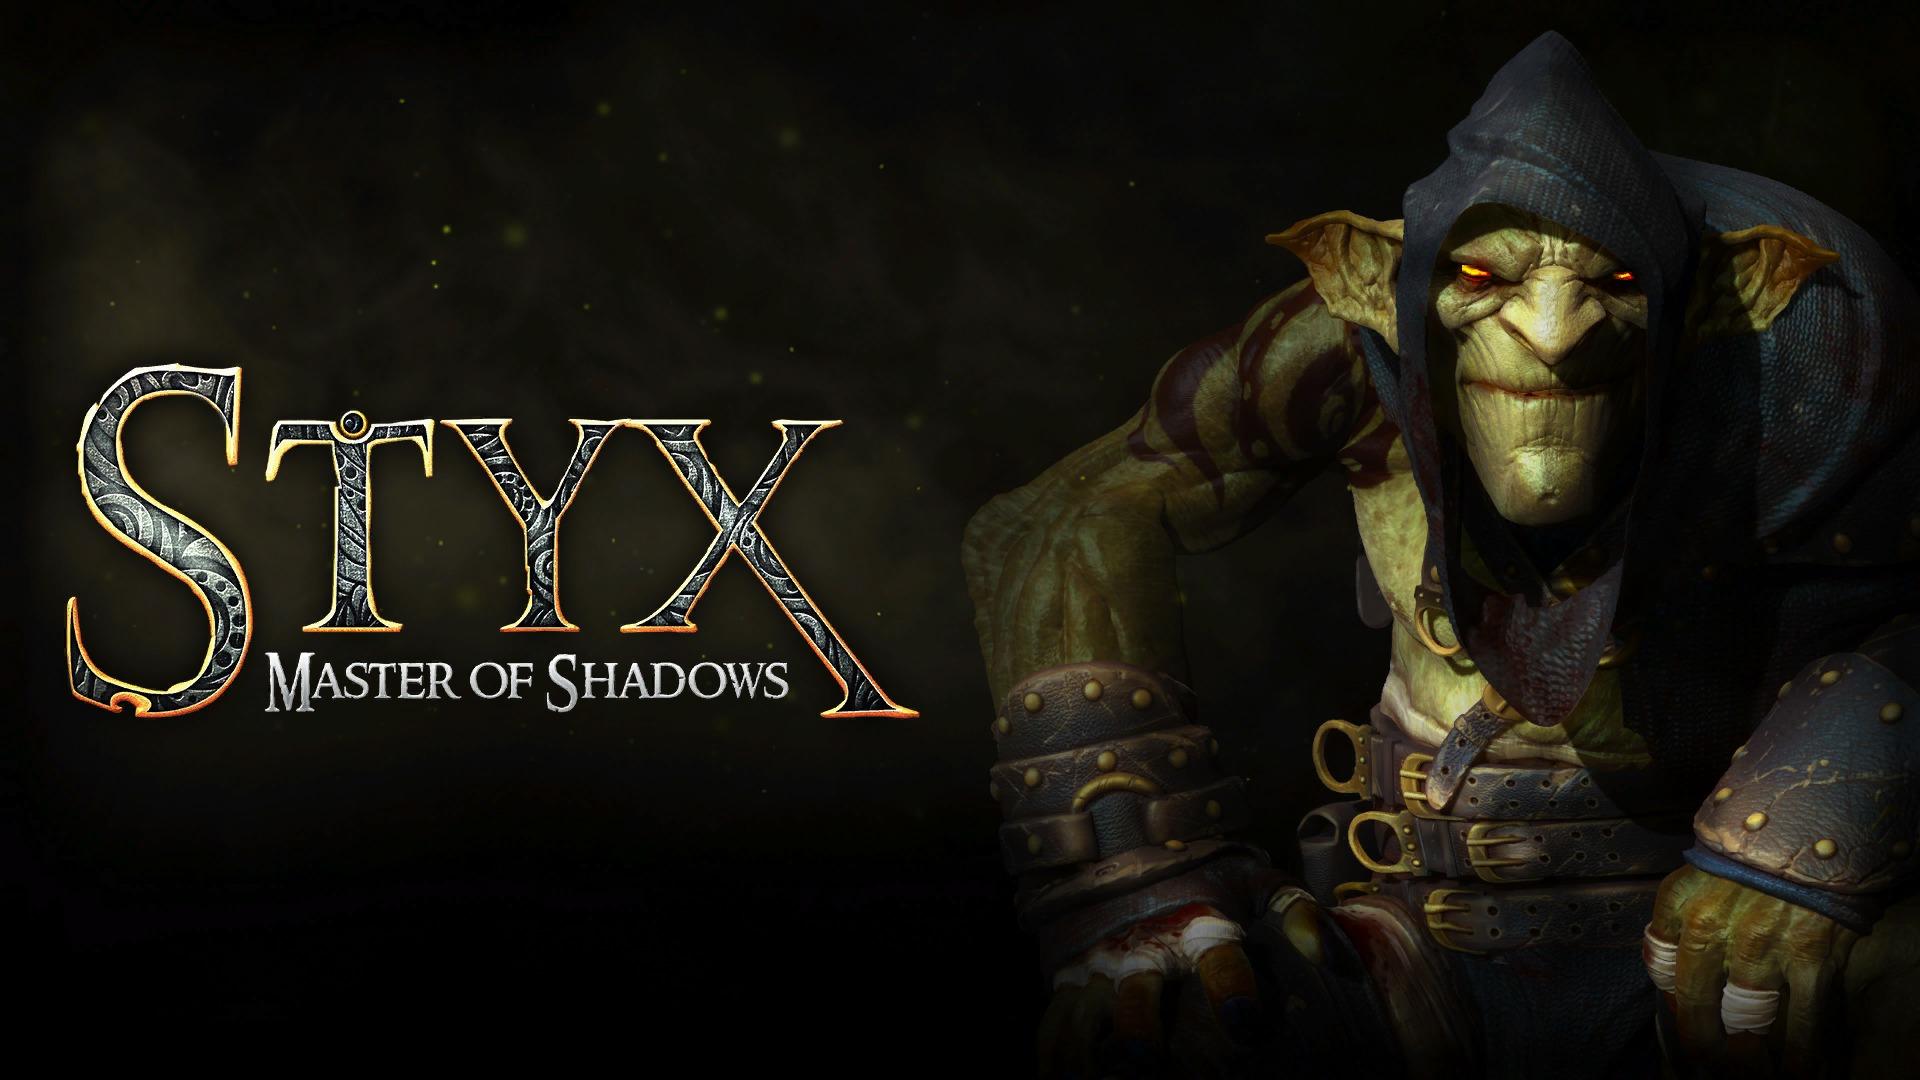 Styx Master of Shadows im Test   PS4source 1920x1080